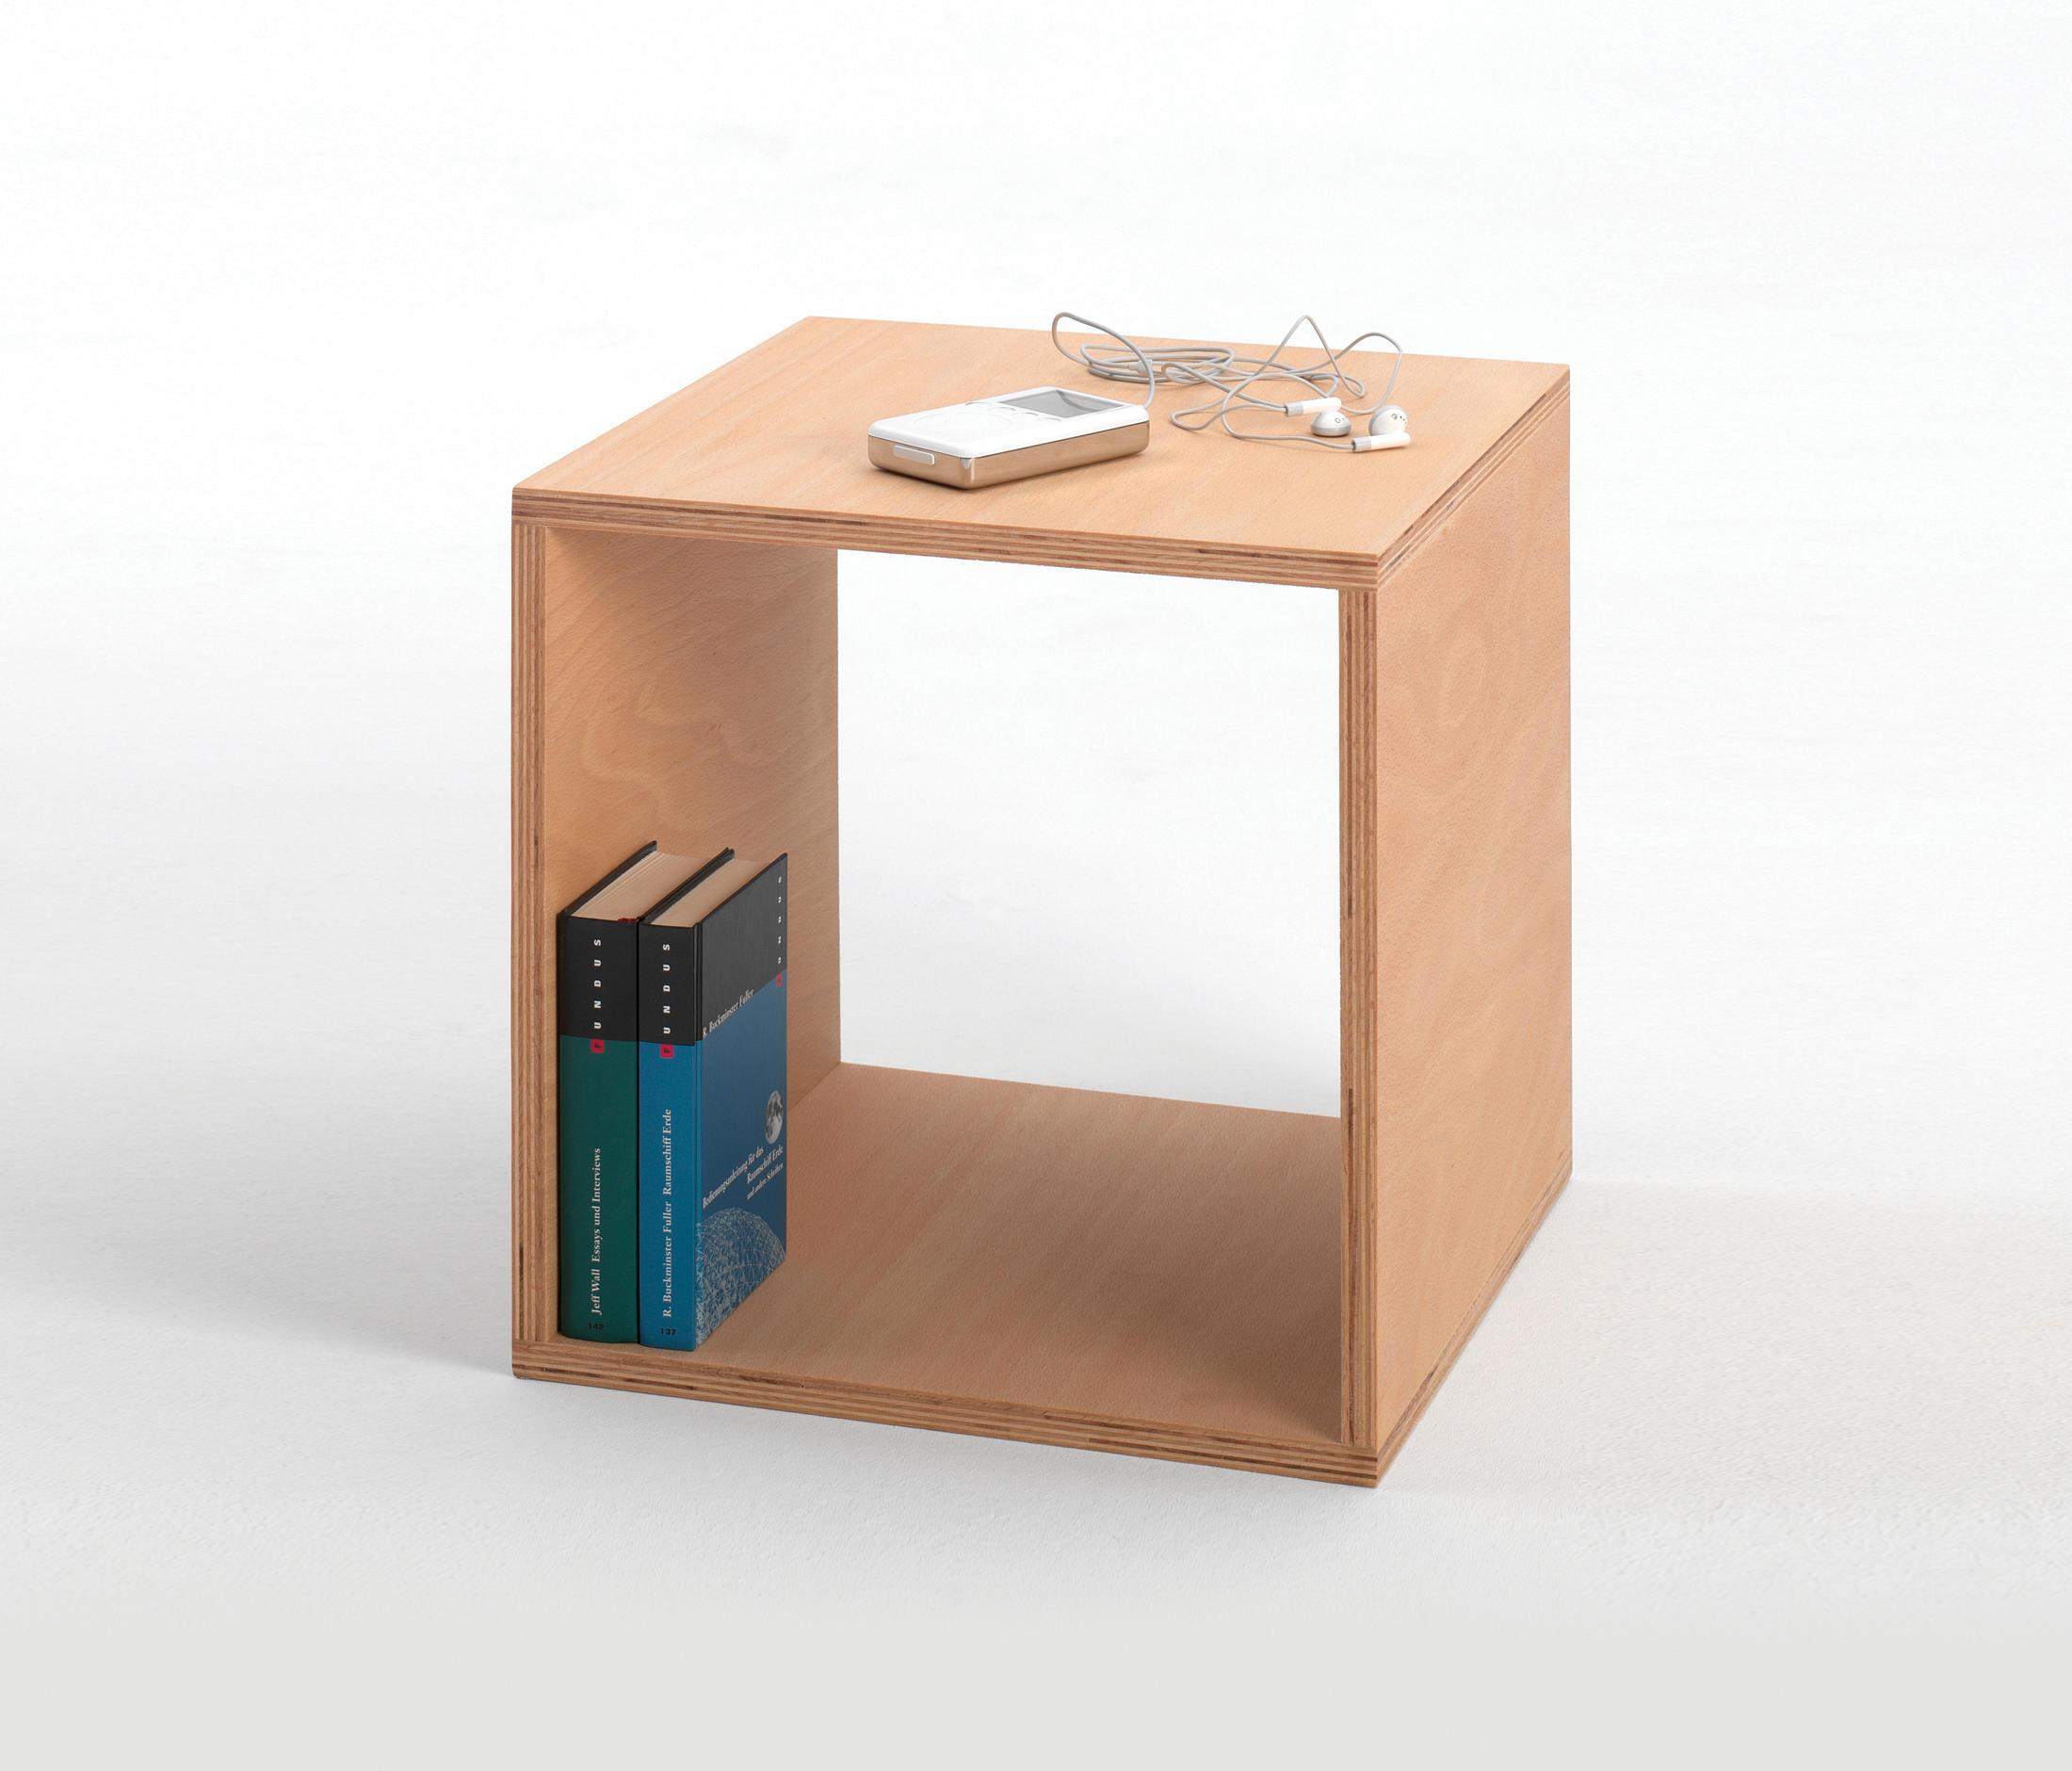 tojo cube nachttische von tojo m bel architonic. Black Bedroom Furniture Sets. Home Design Ideas